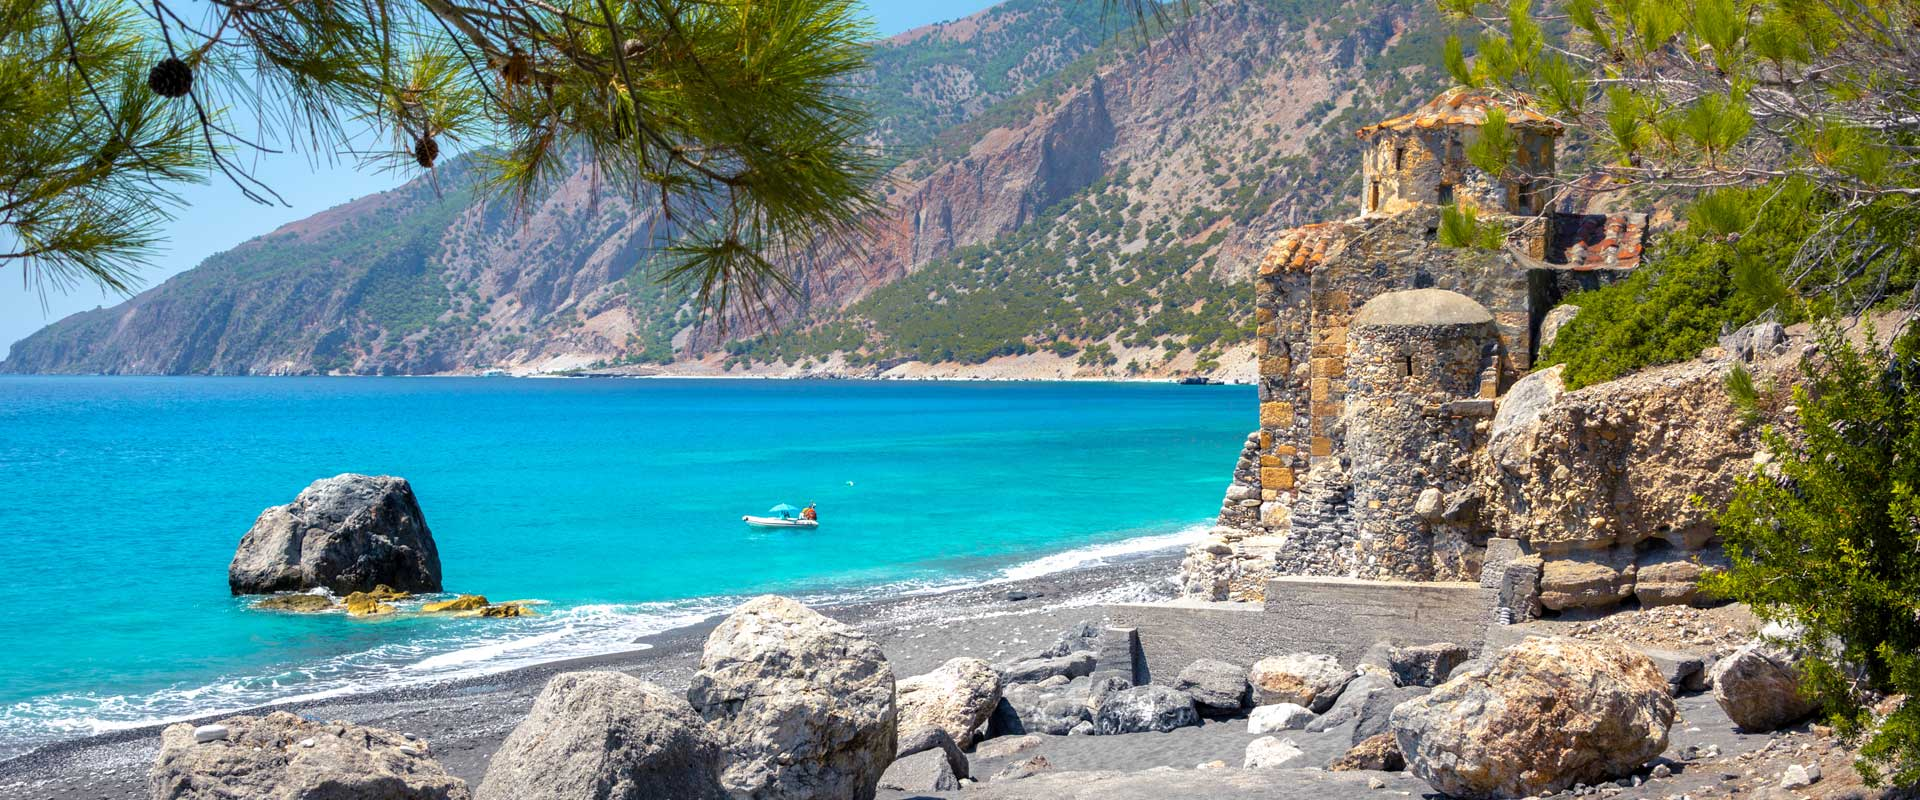 Hiking in Crete